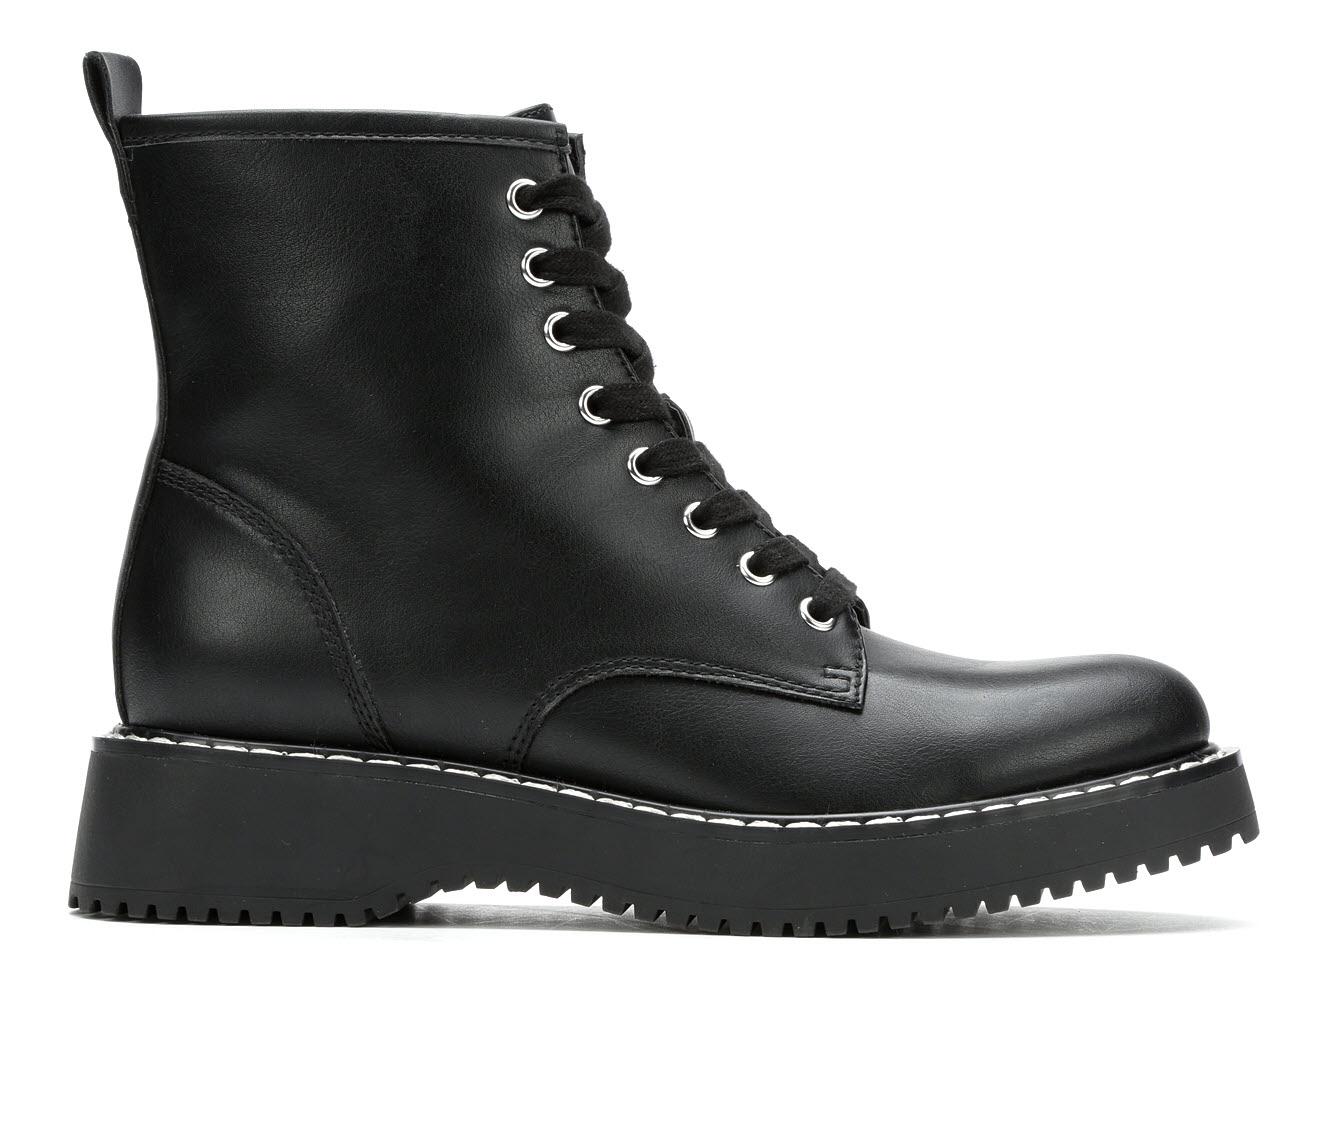 Madden Girl Kurrt Women's Boot (Black Faux Leather)